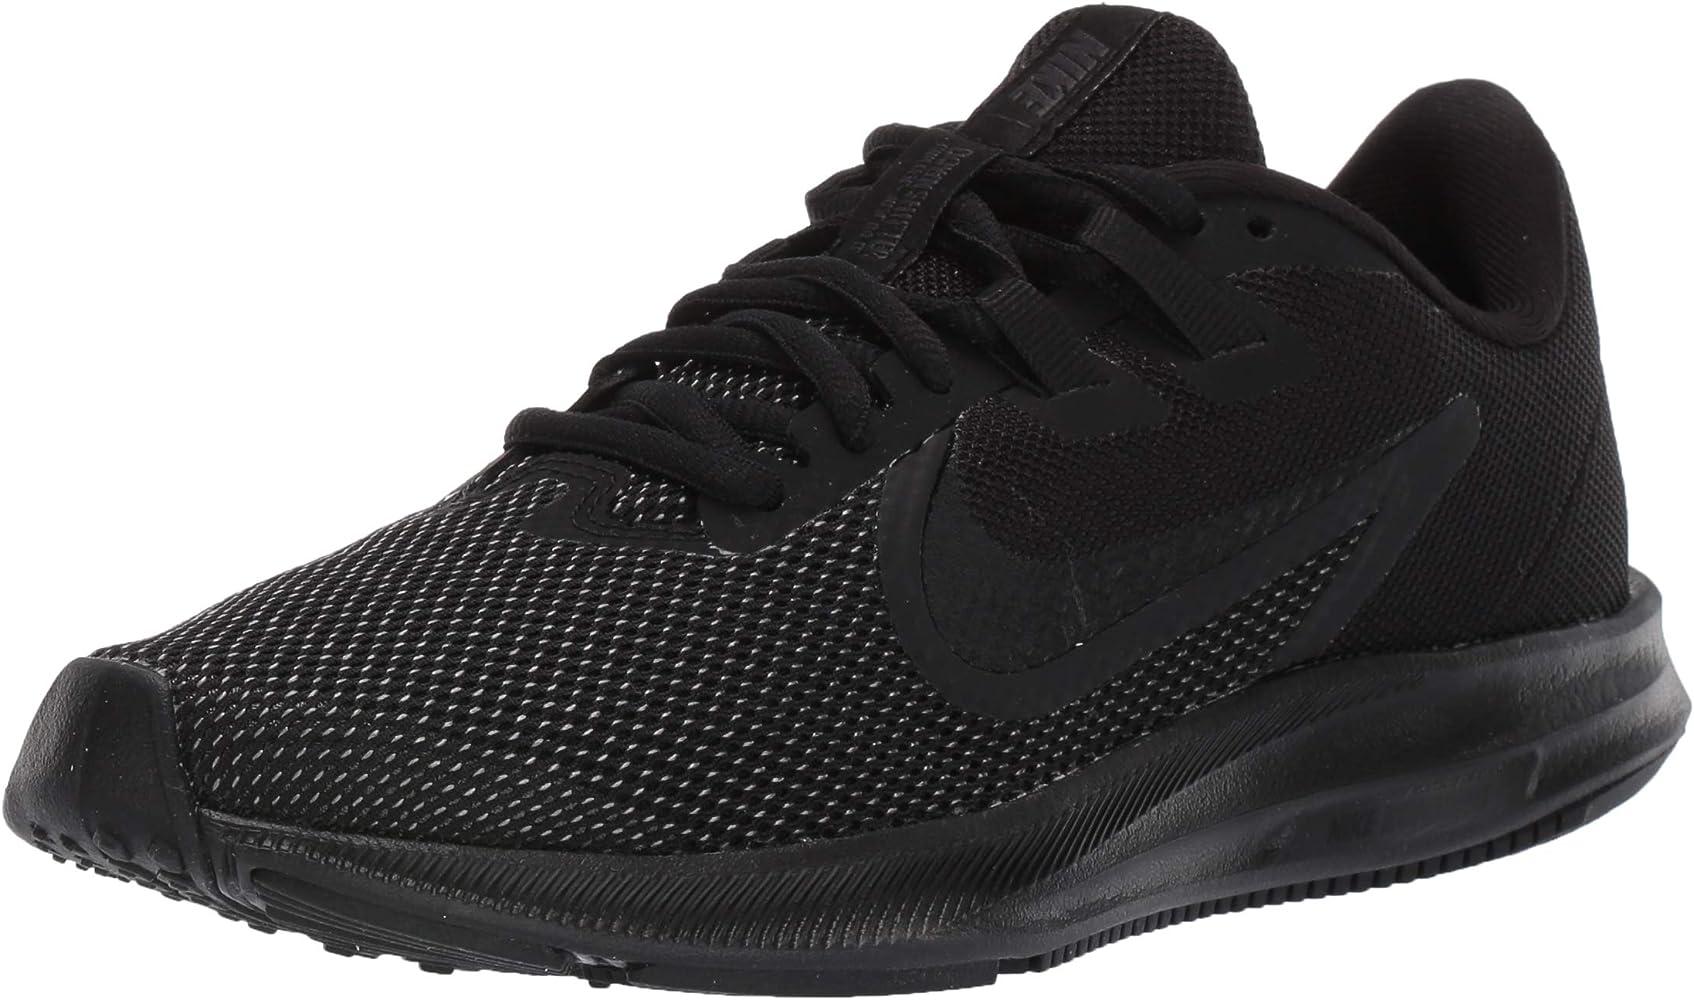 6ffdedc88461e Women's Downshifter 9 Running Shoe, Black-Anthracite, 12 Regular US